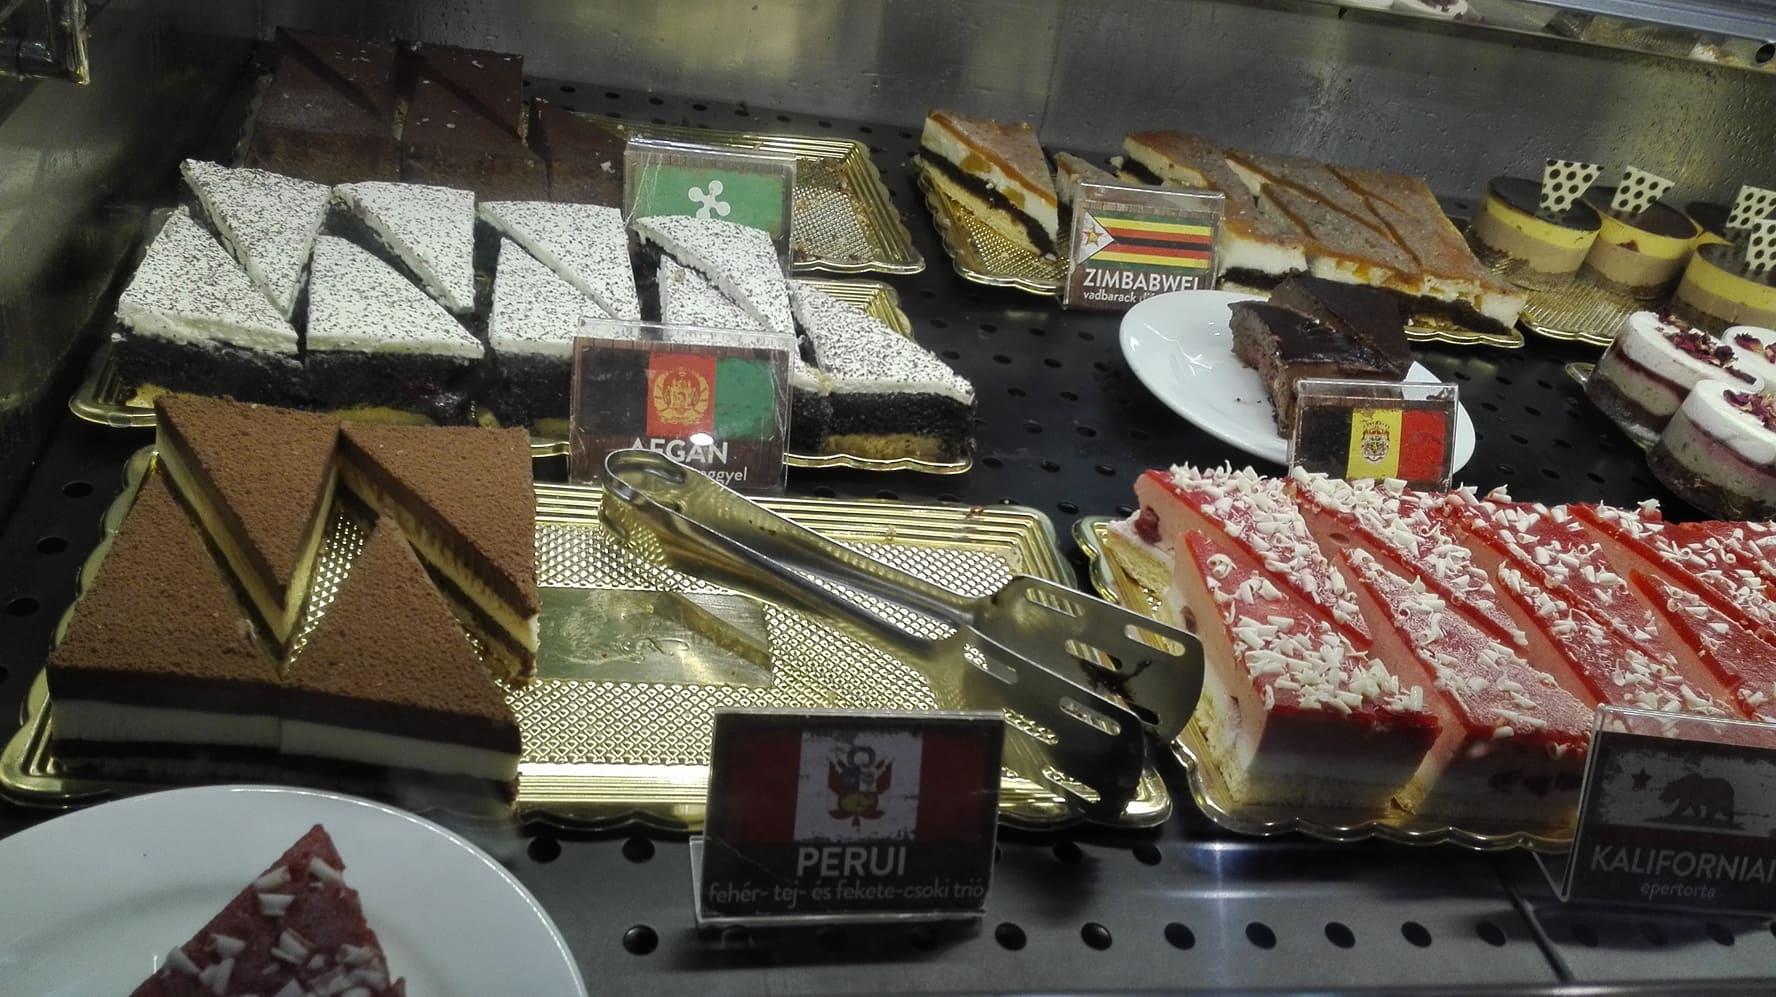 Café Frei's cakes